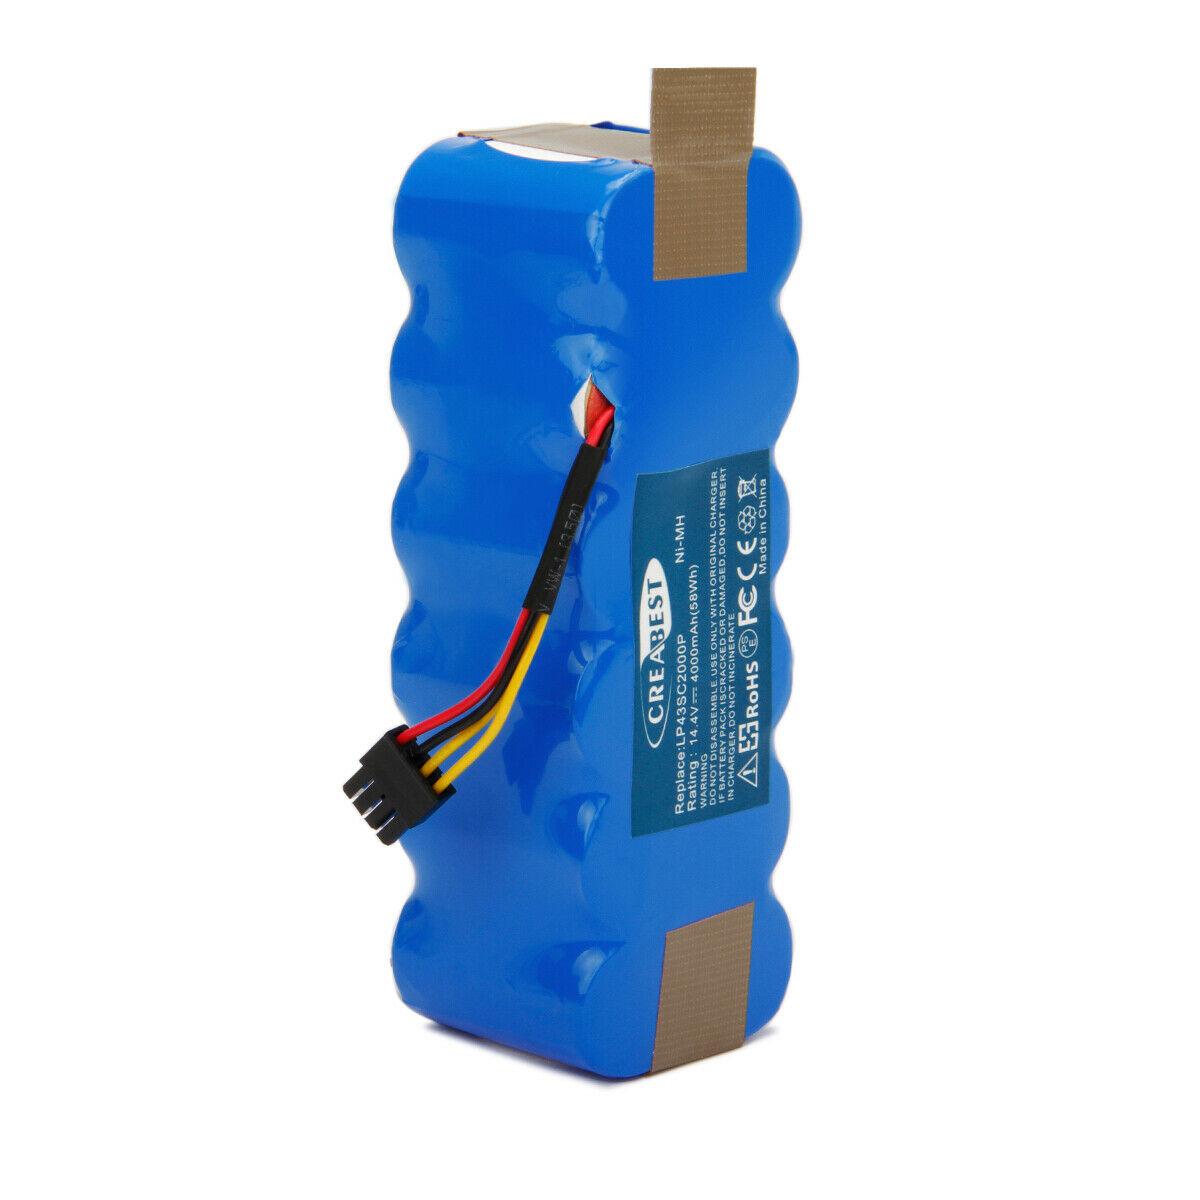 Batterie 4Ah 14.4V Ni-MH Ariete Briciola 2712 2713 2717 Dibea Cobos KK-8 X-500(compatible)